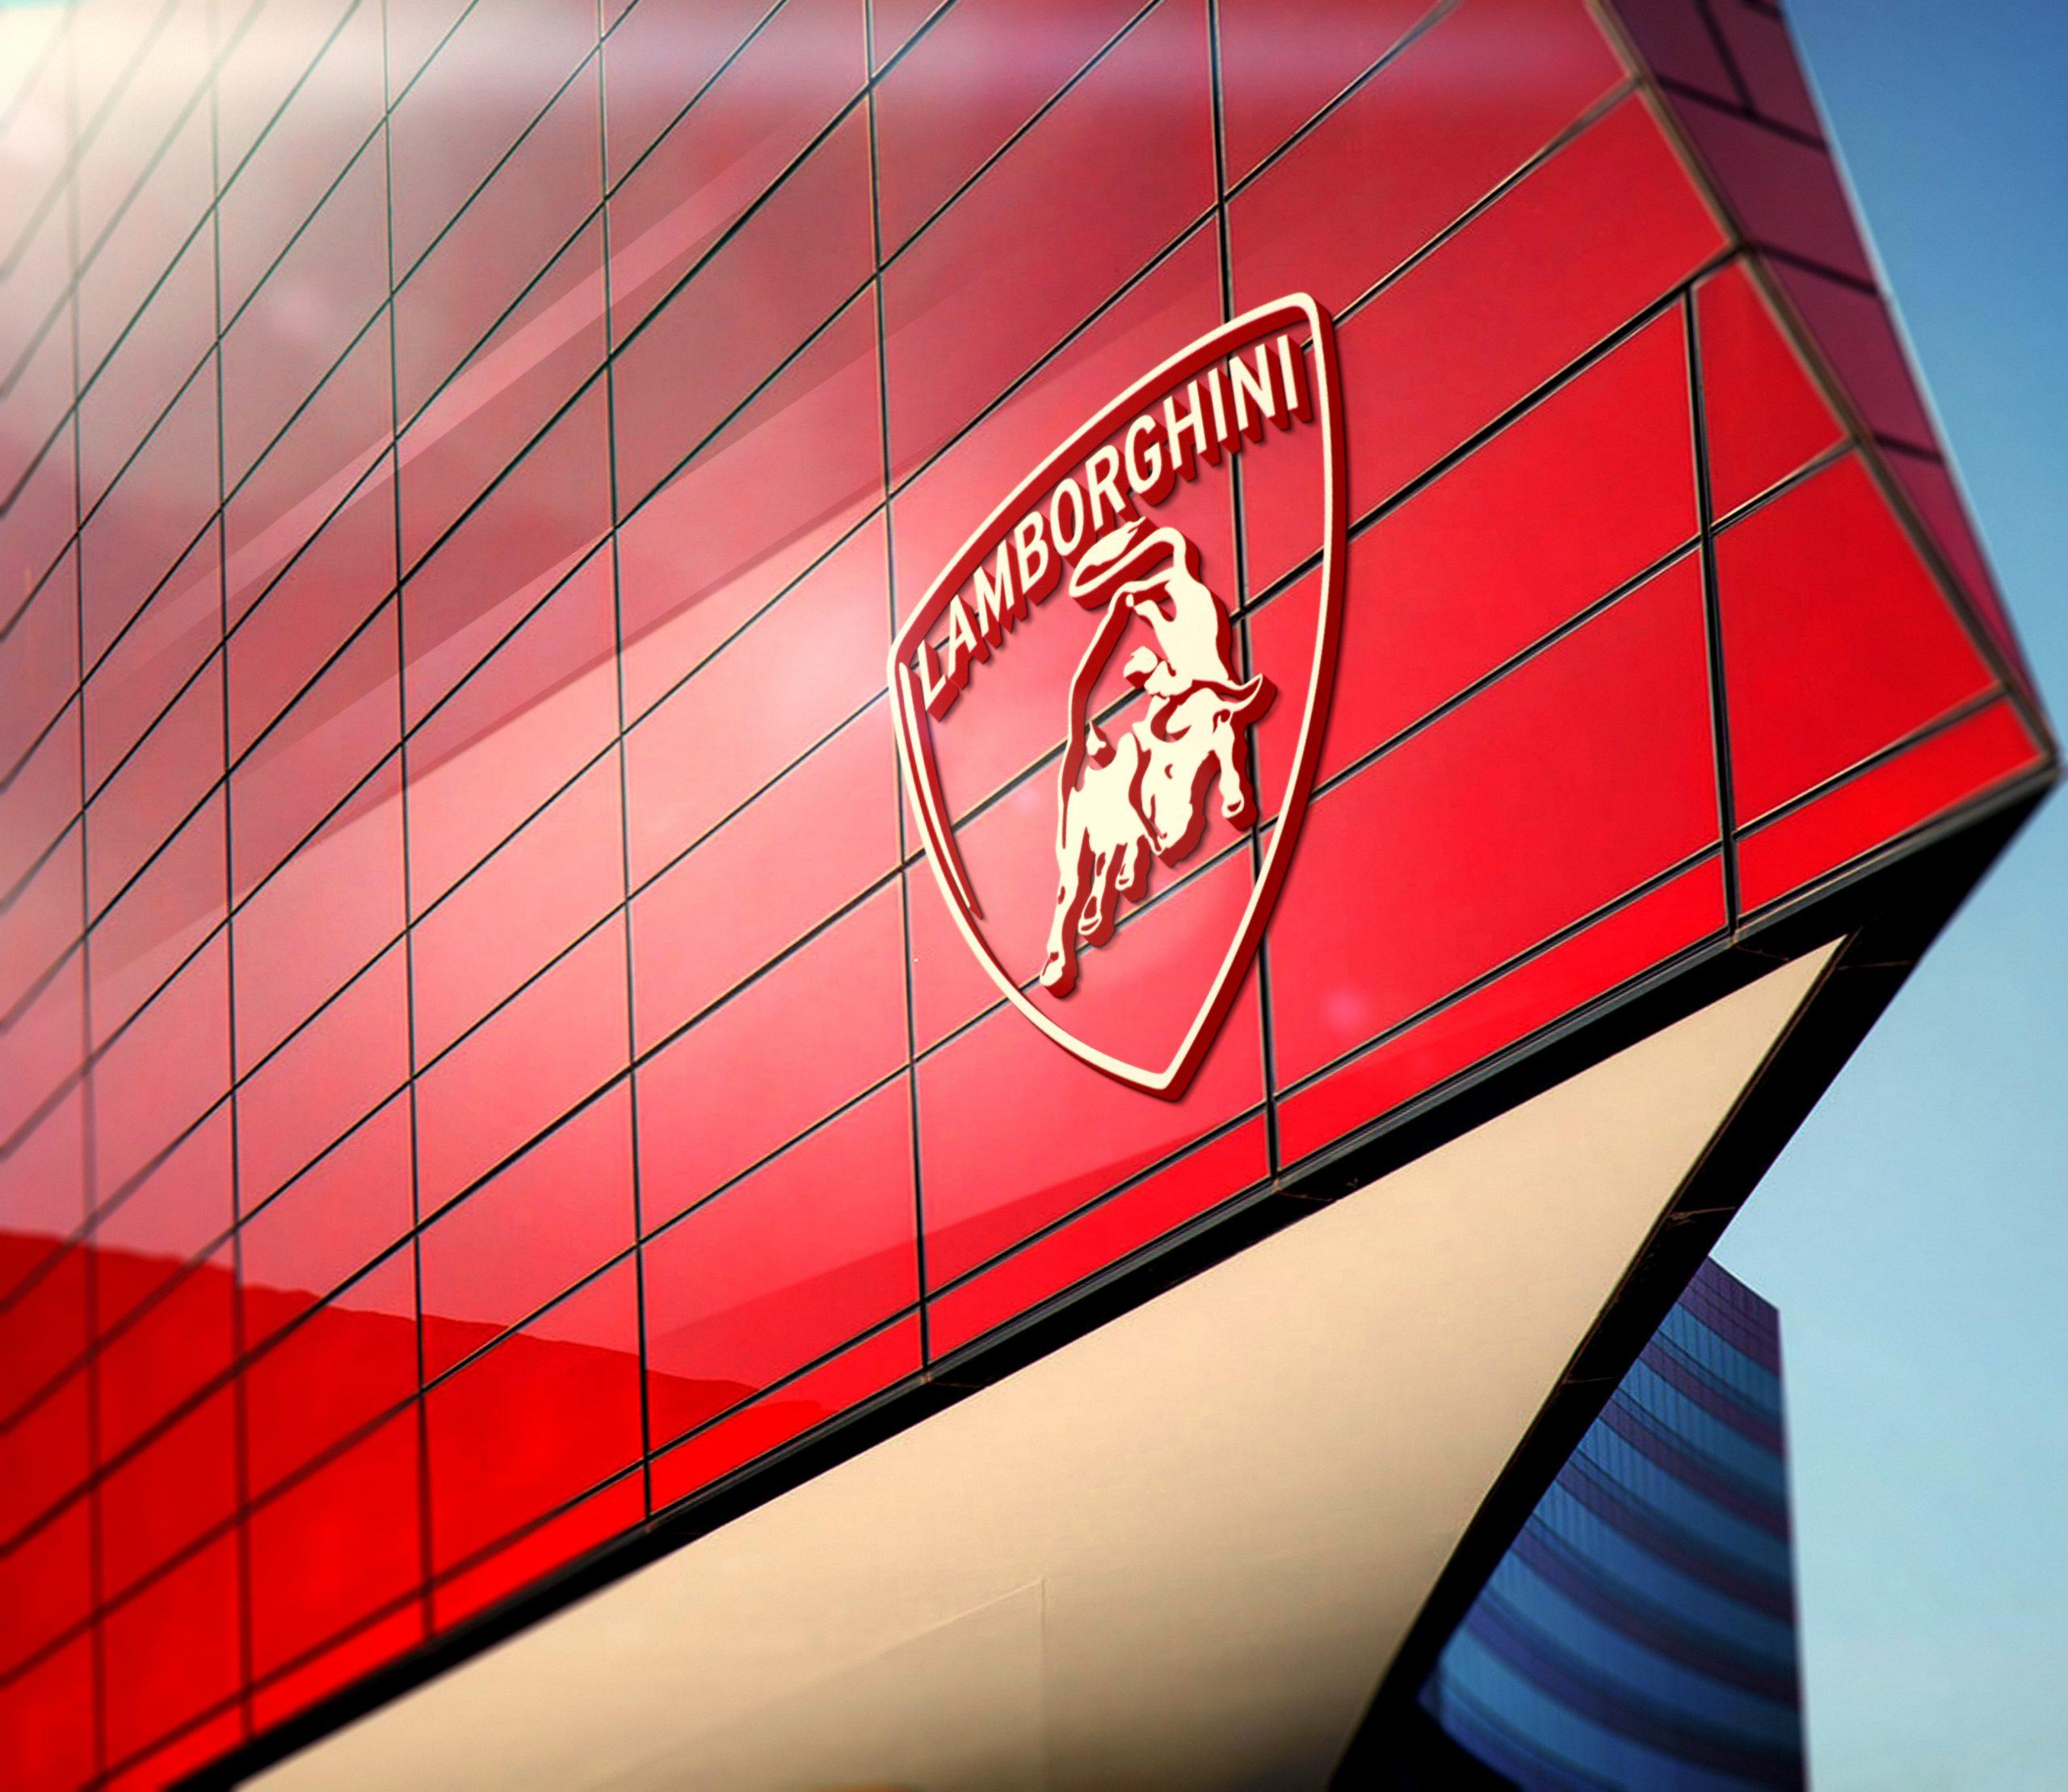 Lamborghini Free 3D Red Building Facade Logo Mockup